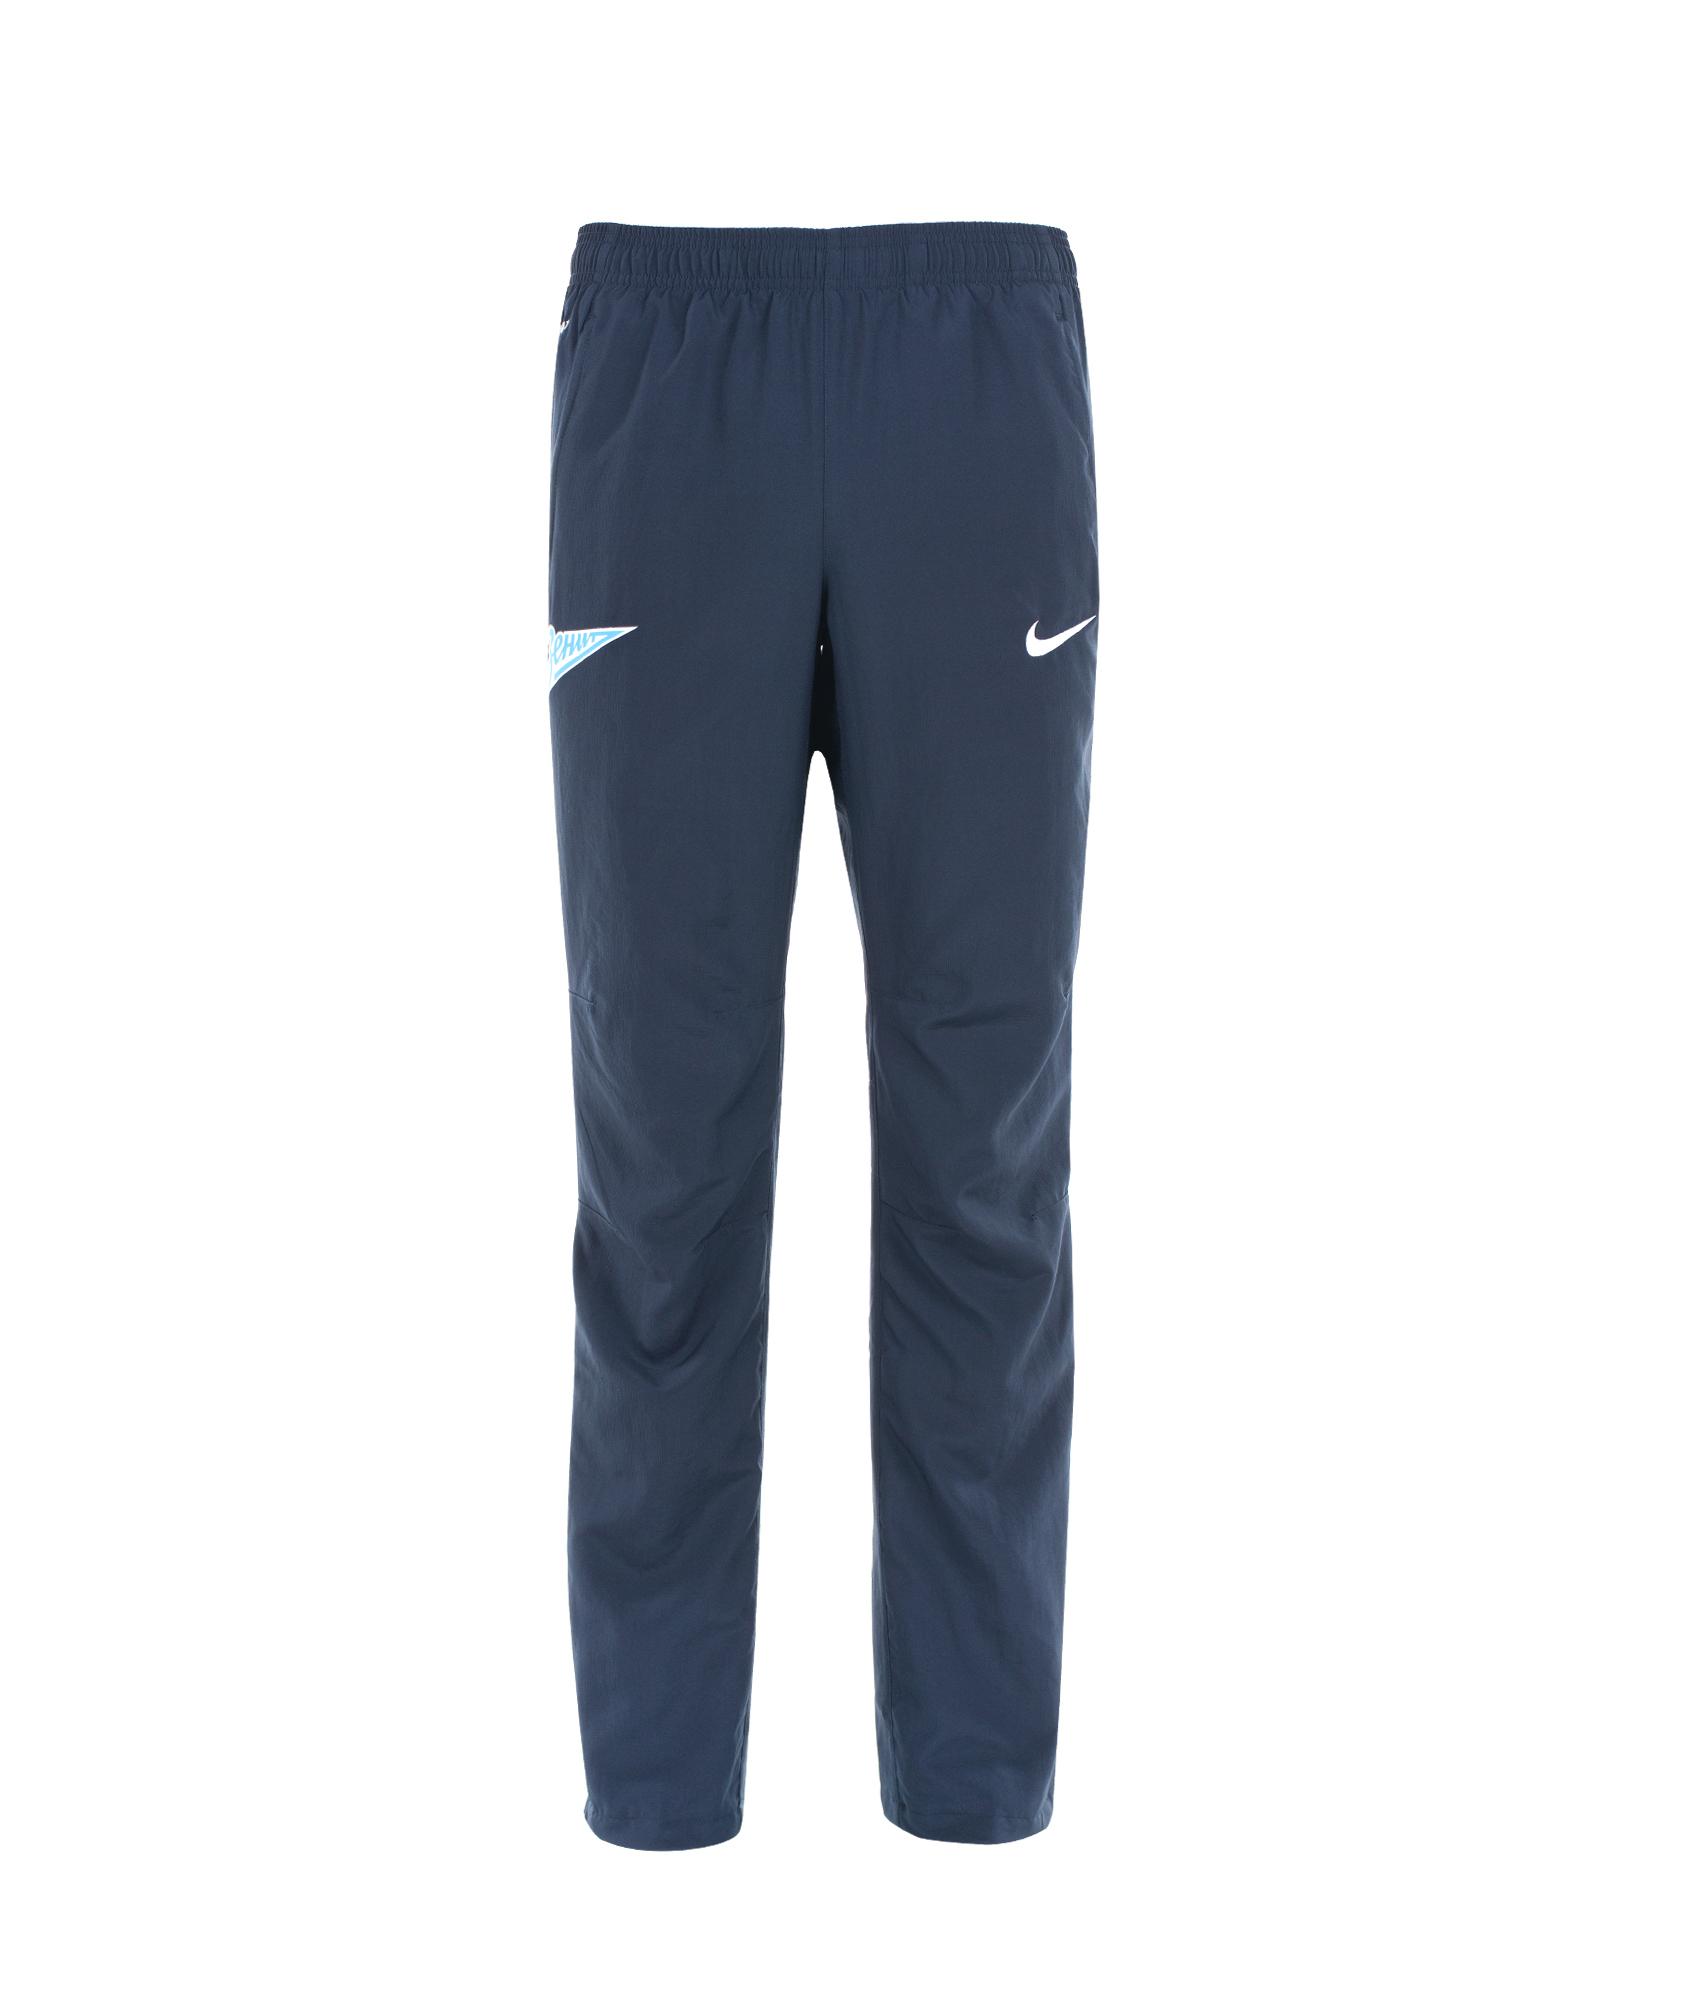 Брюки парадные Nike SQUAD SDLN WVN PANT, Цвет-Темно-Синий, Размер-XXL